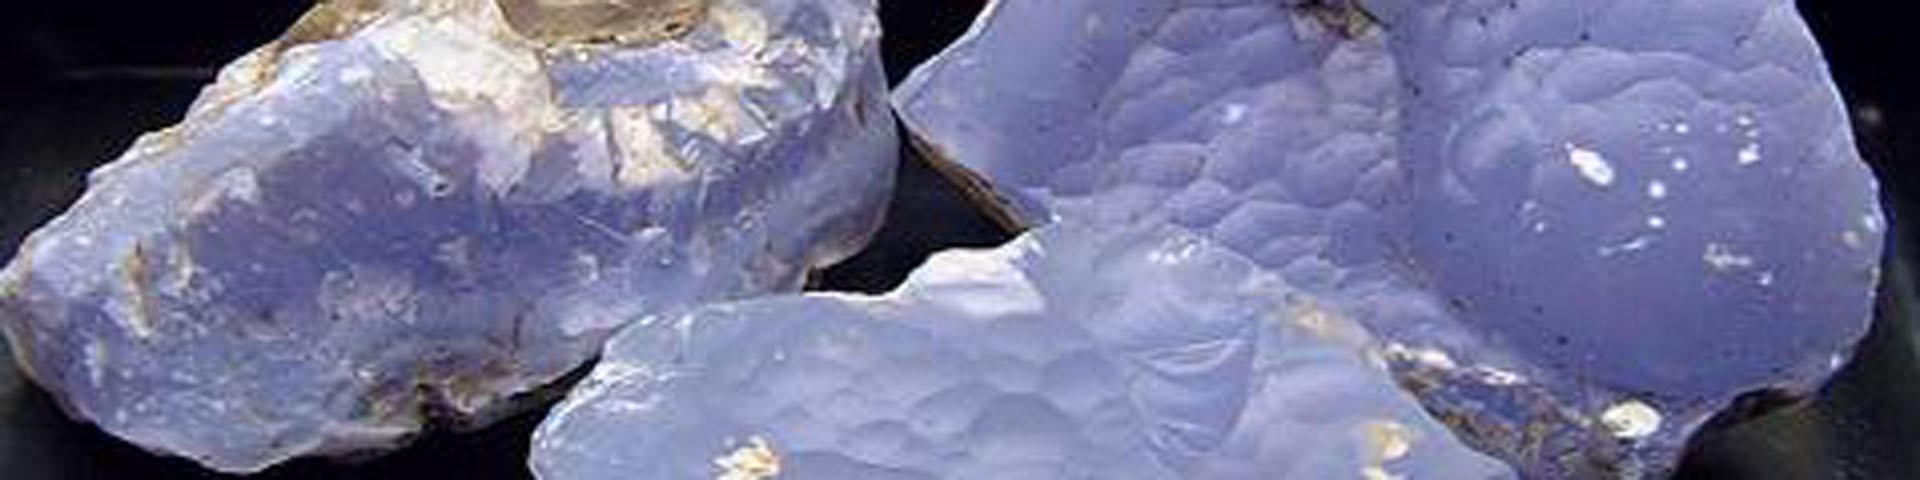 Several samples of blue-white stone